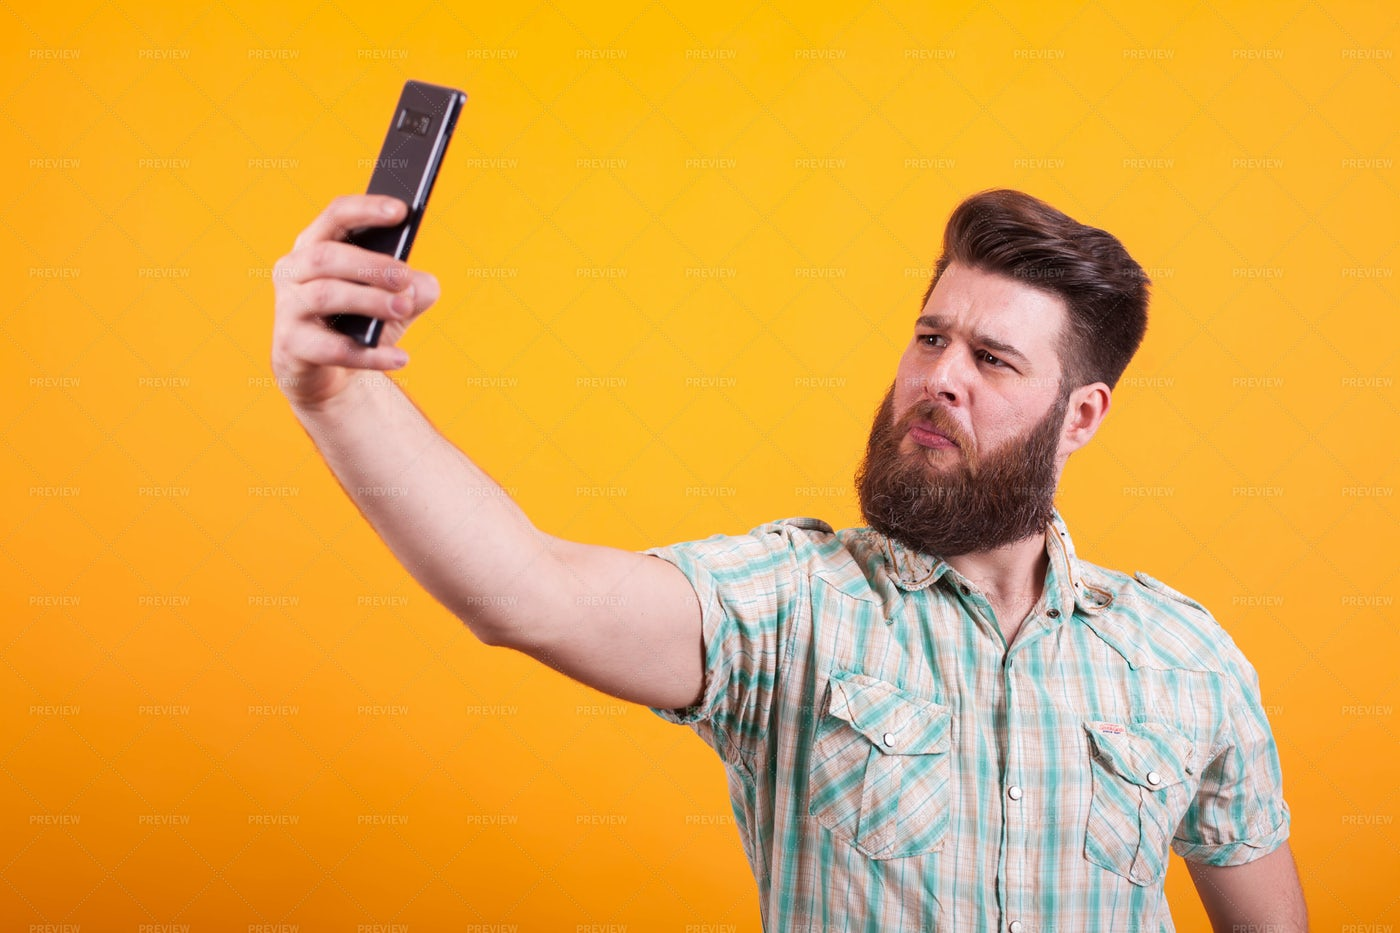 Man In Plaid Takes Selfie: Stock Photos